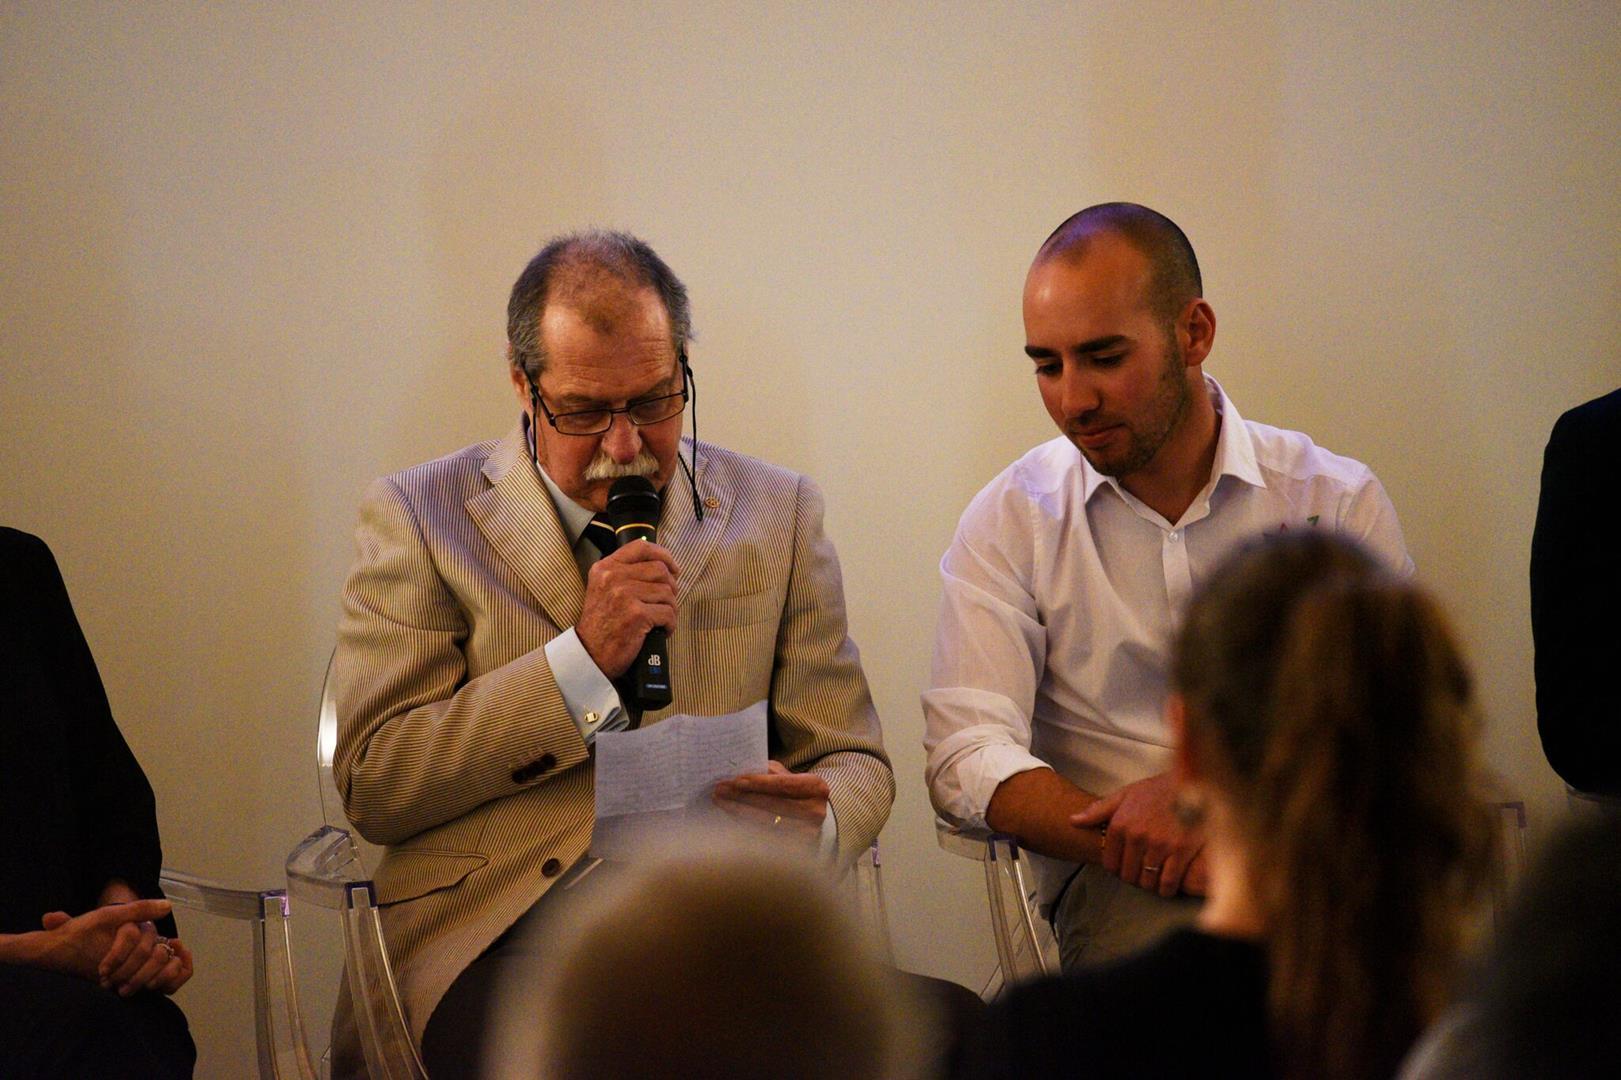 with-luigi-bartali-son-of-gino-bartali-in-florence-2017-copy